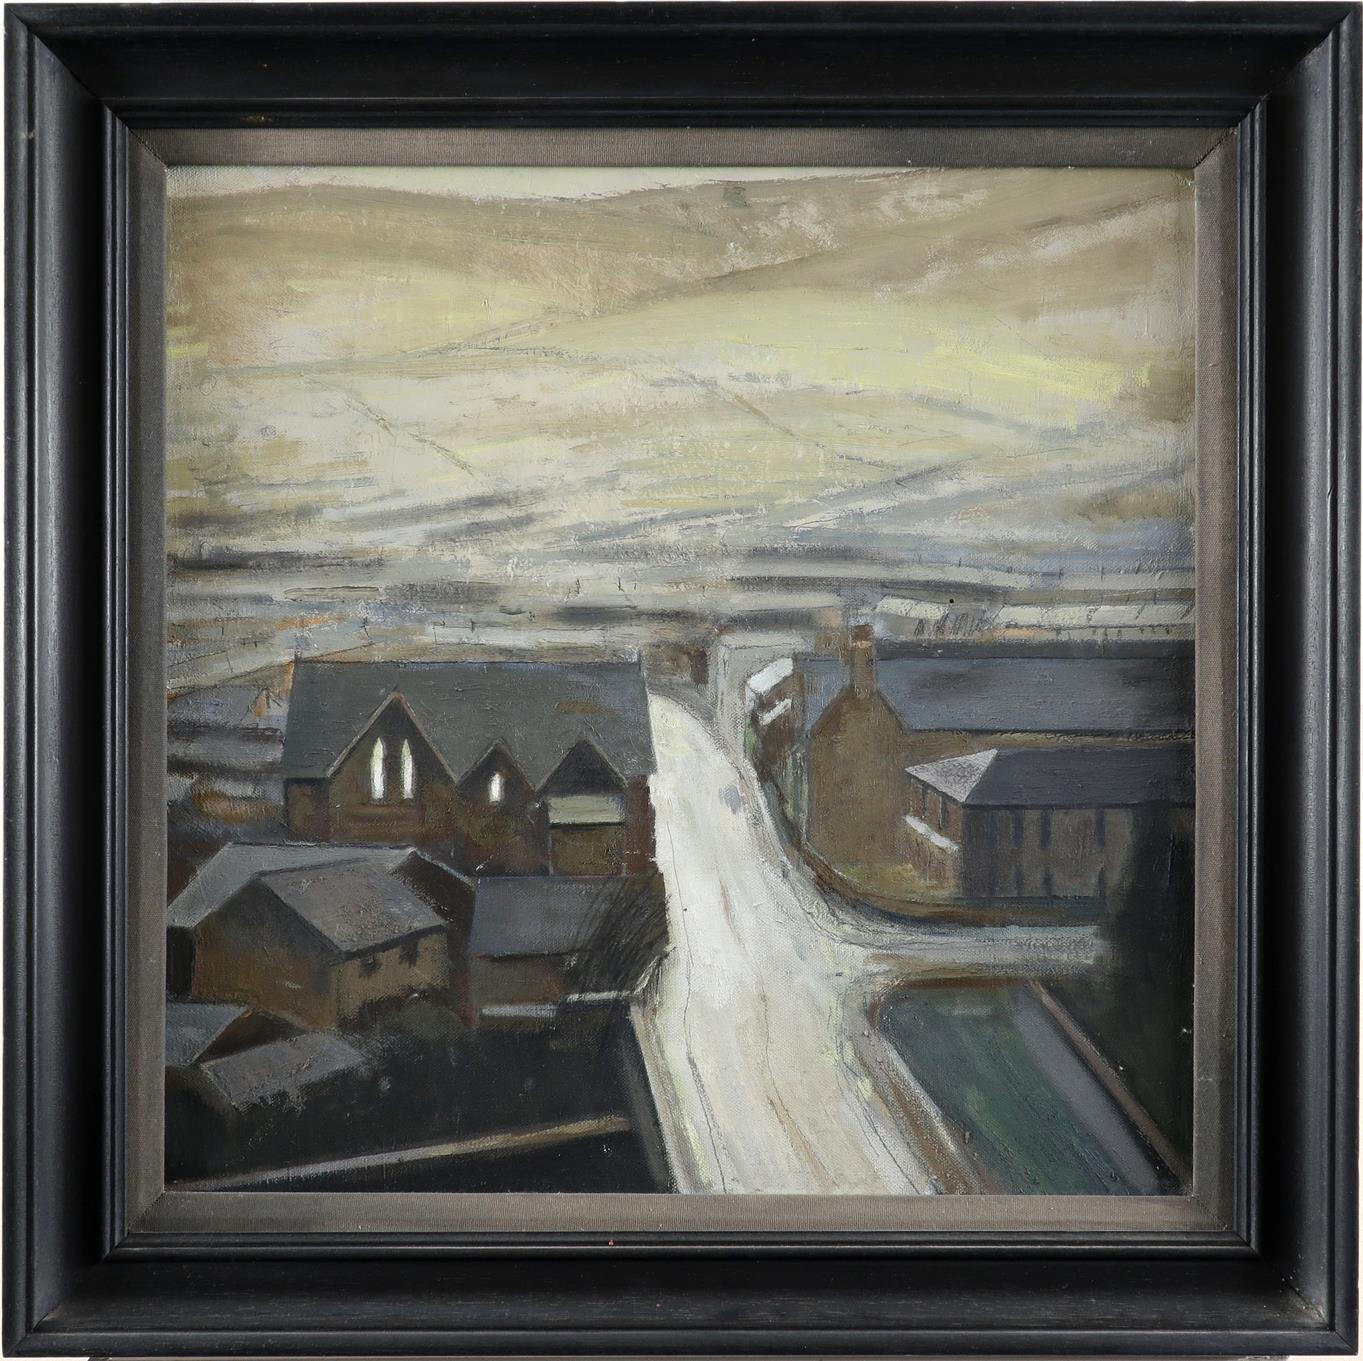 ‡Charles Burton (Welsh b.1929) Rhondda Fawr Oil on canvas 48 x 48cm Provenance: Martin Tinney - Image 2 of 3